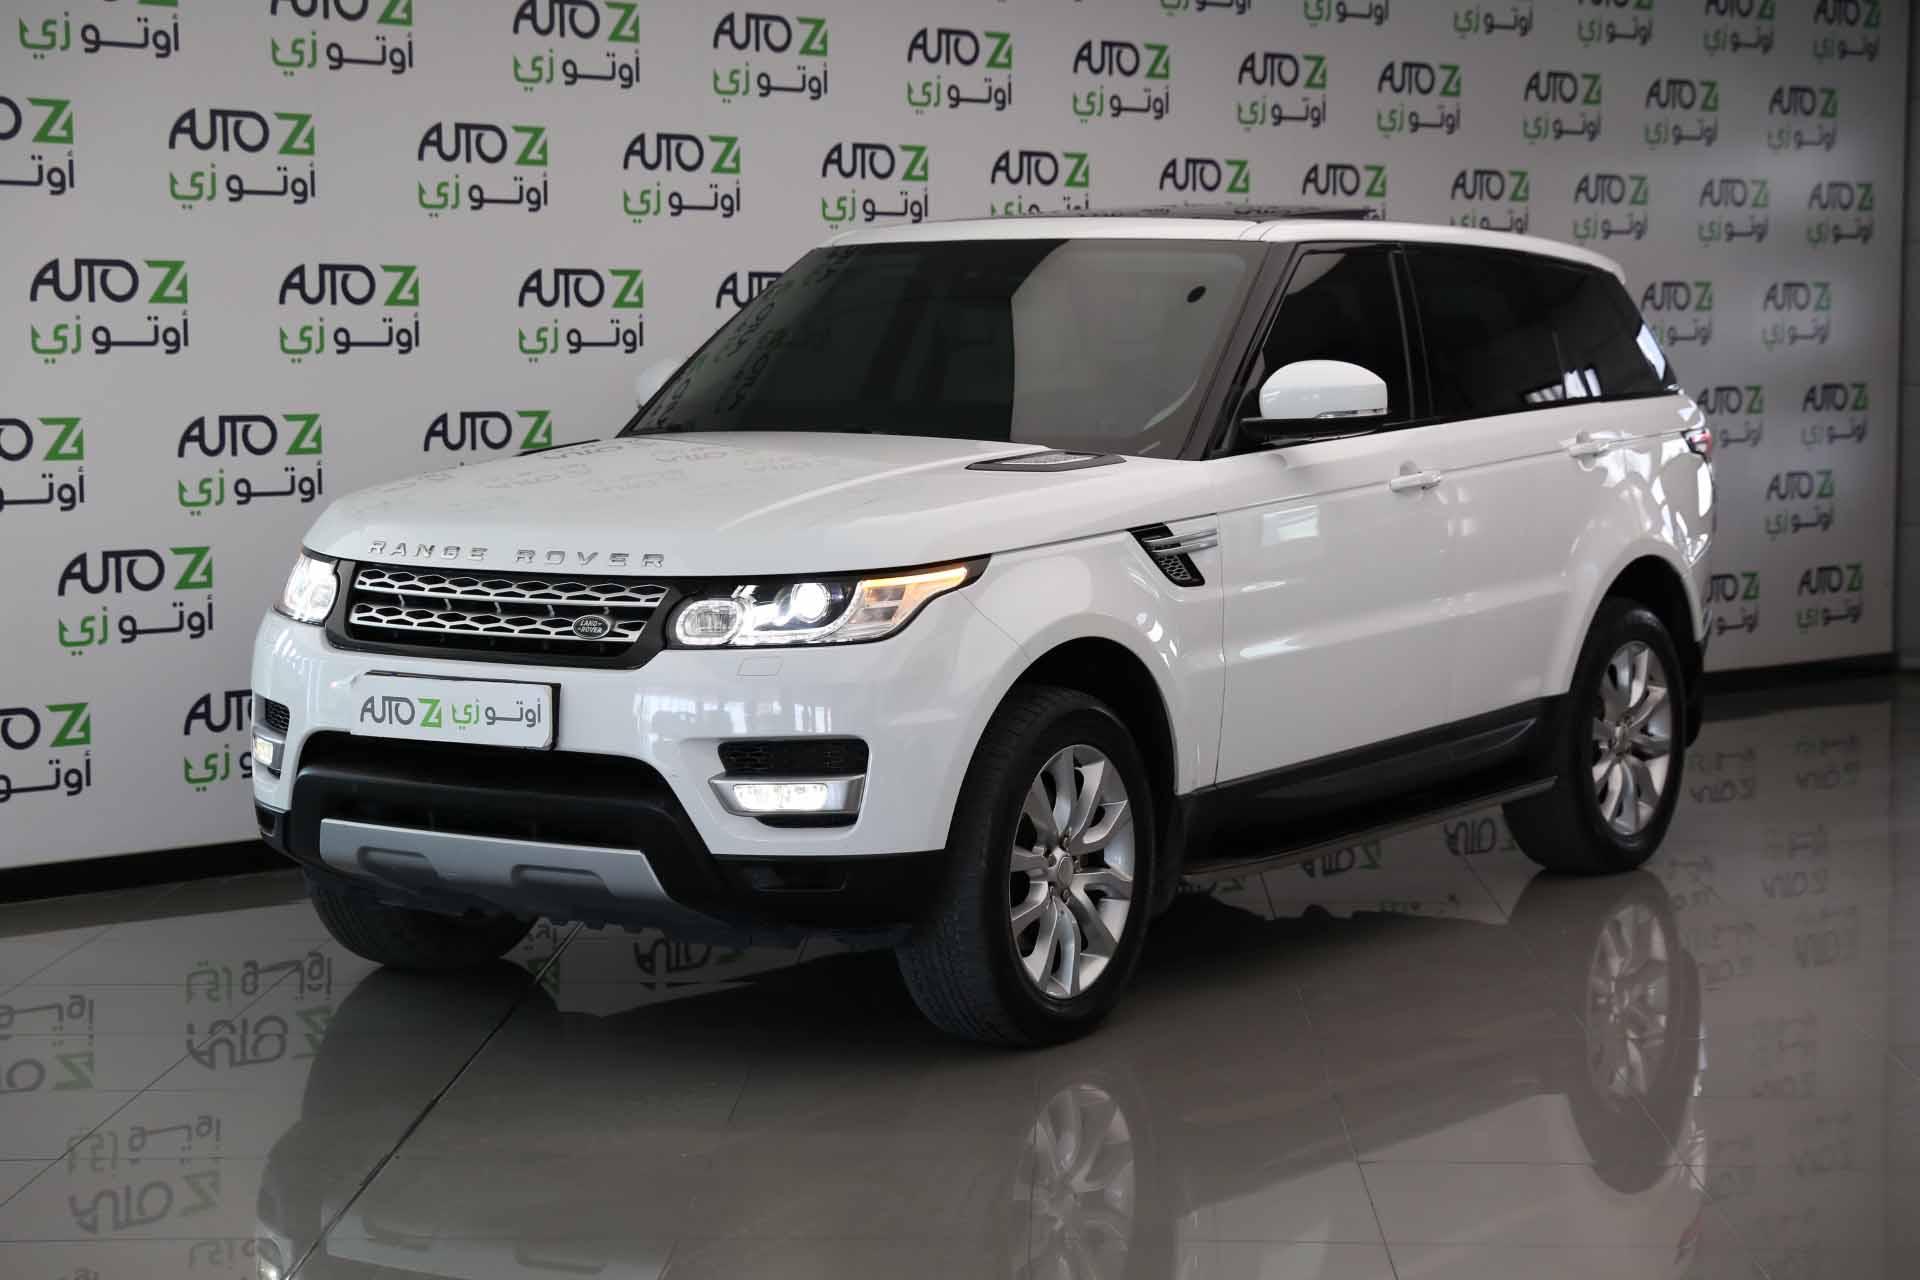 Range Rover Sport HSE—-2014